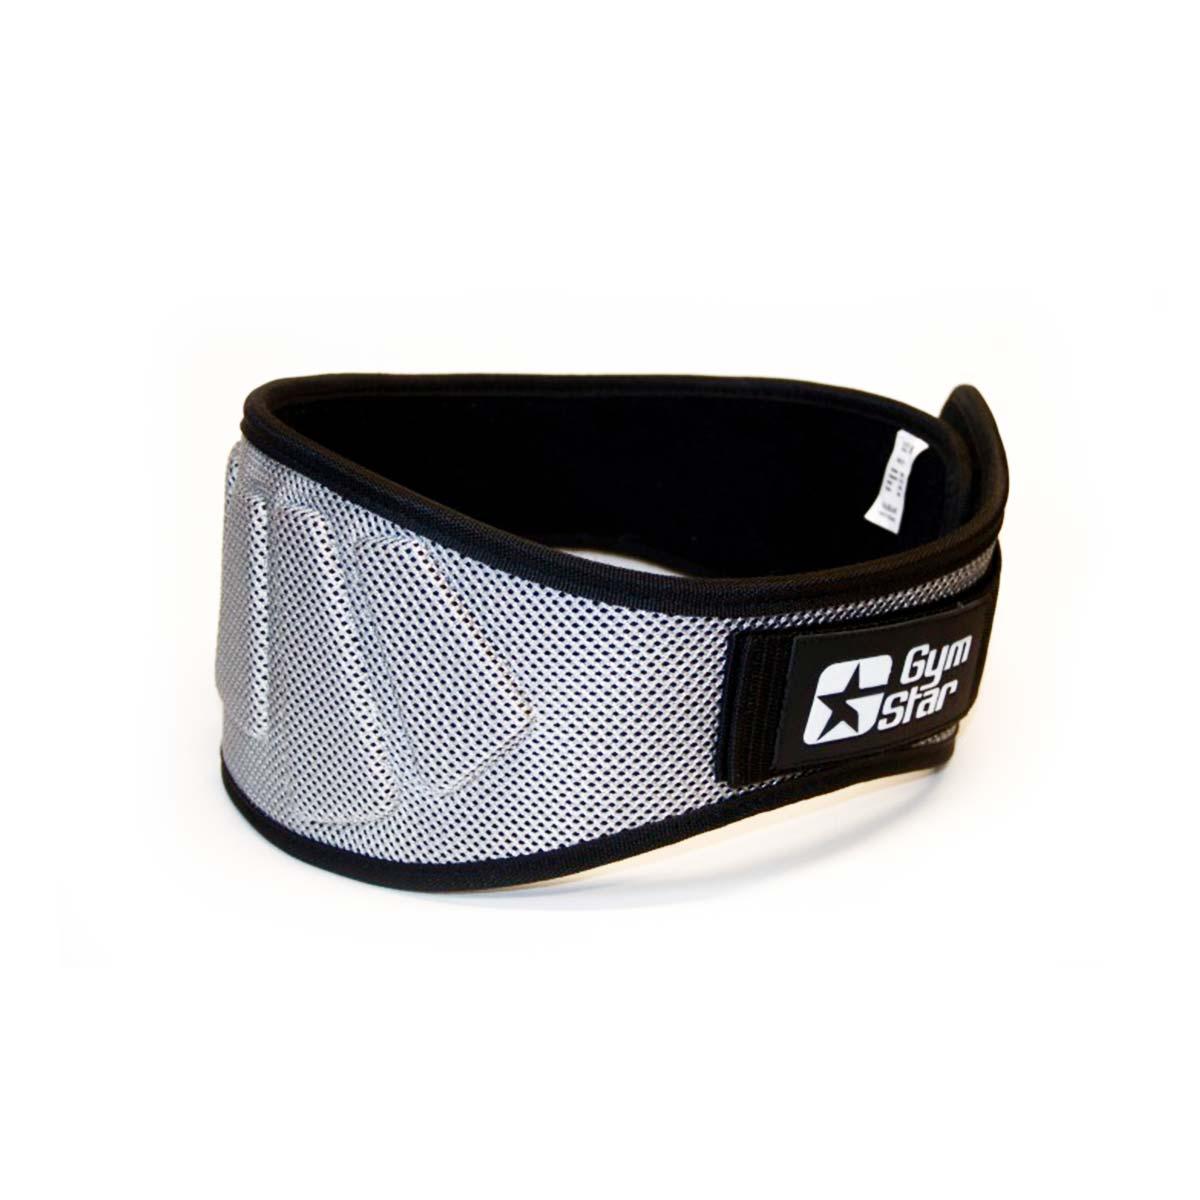 Cinturon Extra Support GYMSTAR